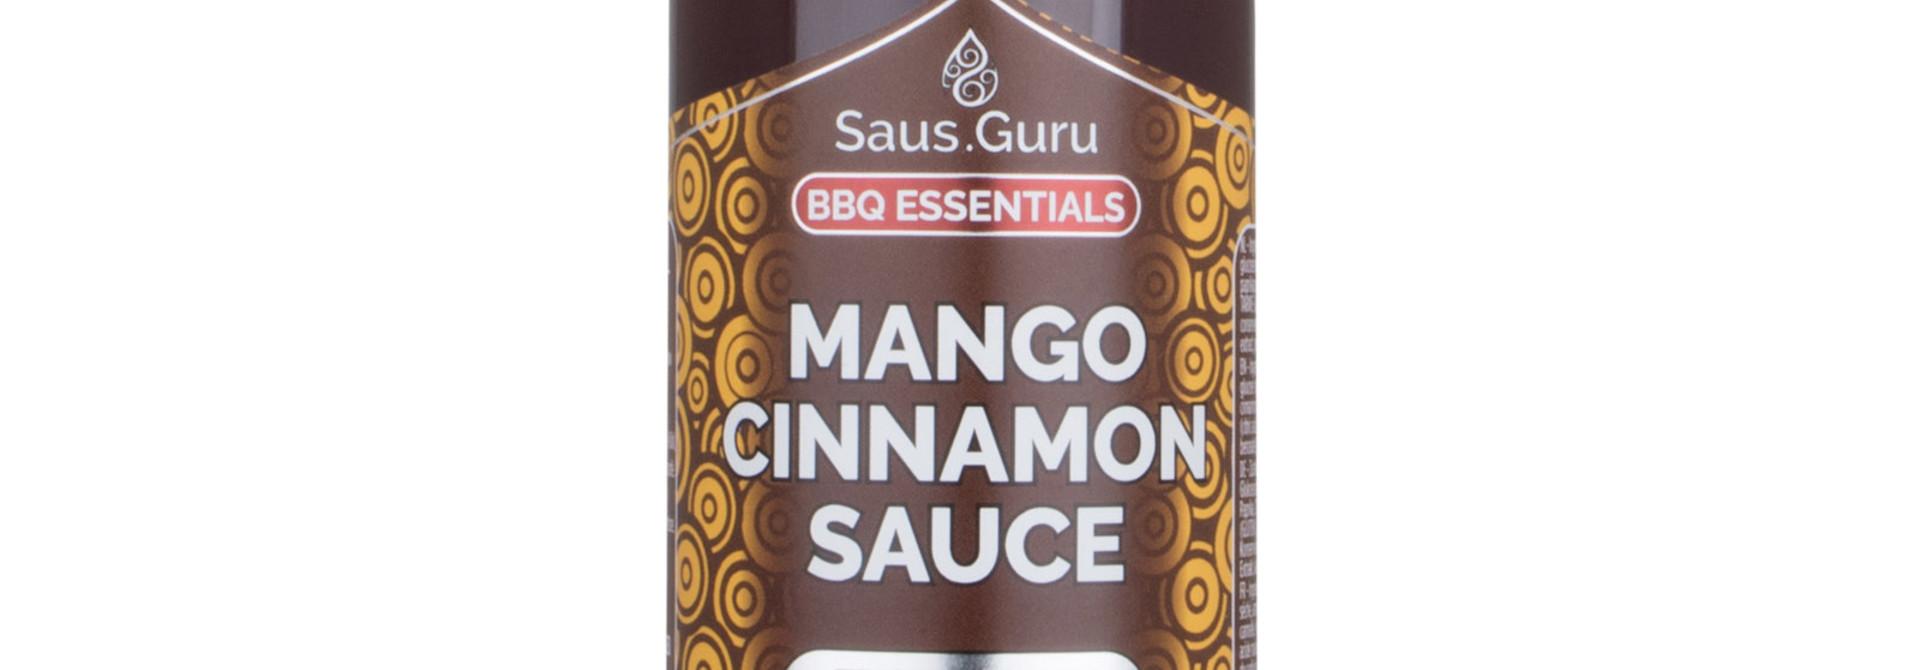 Saus.Guru's Mango Cinnamon BBQ Sauce